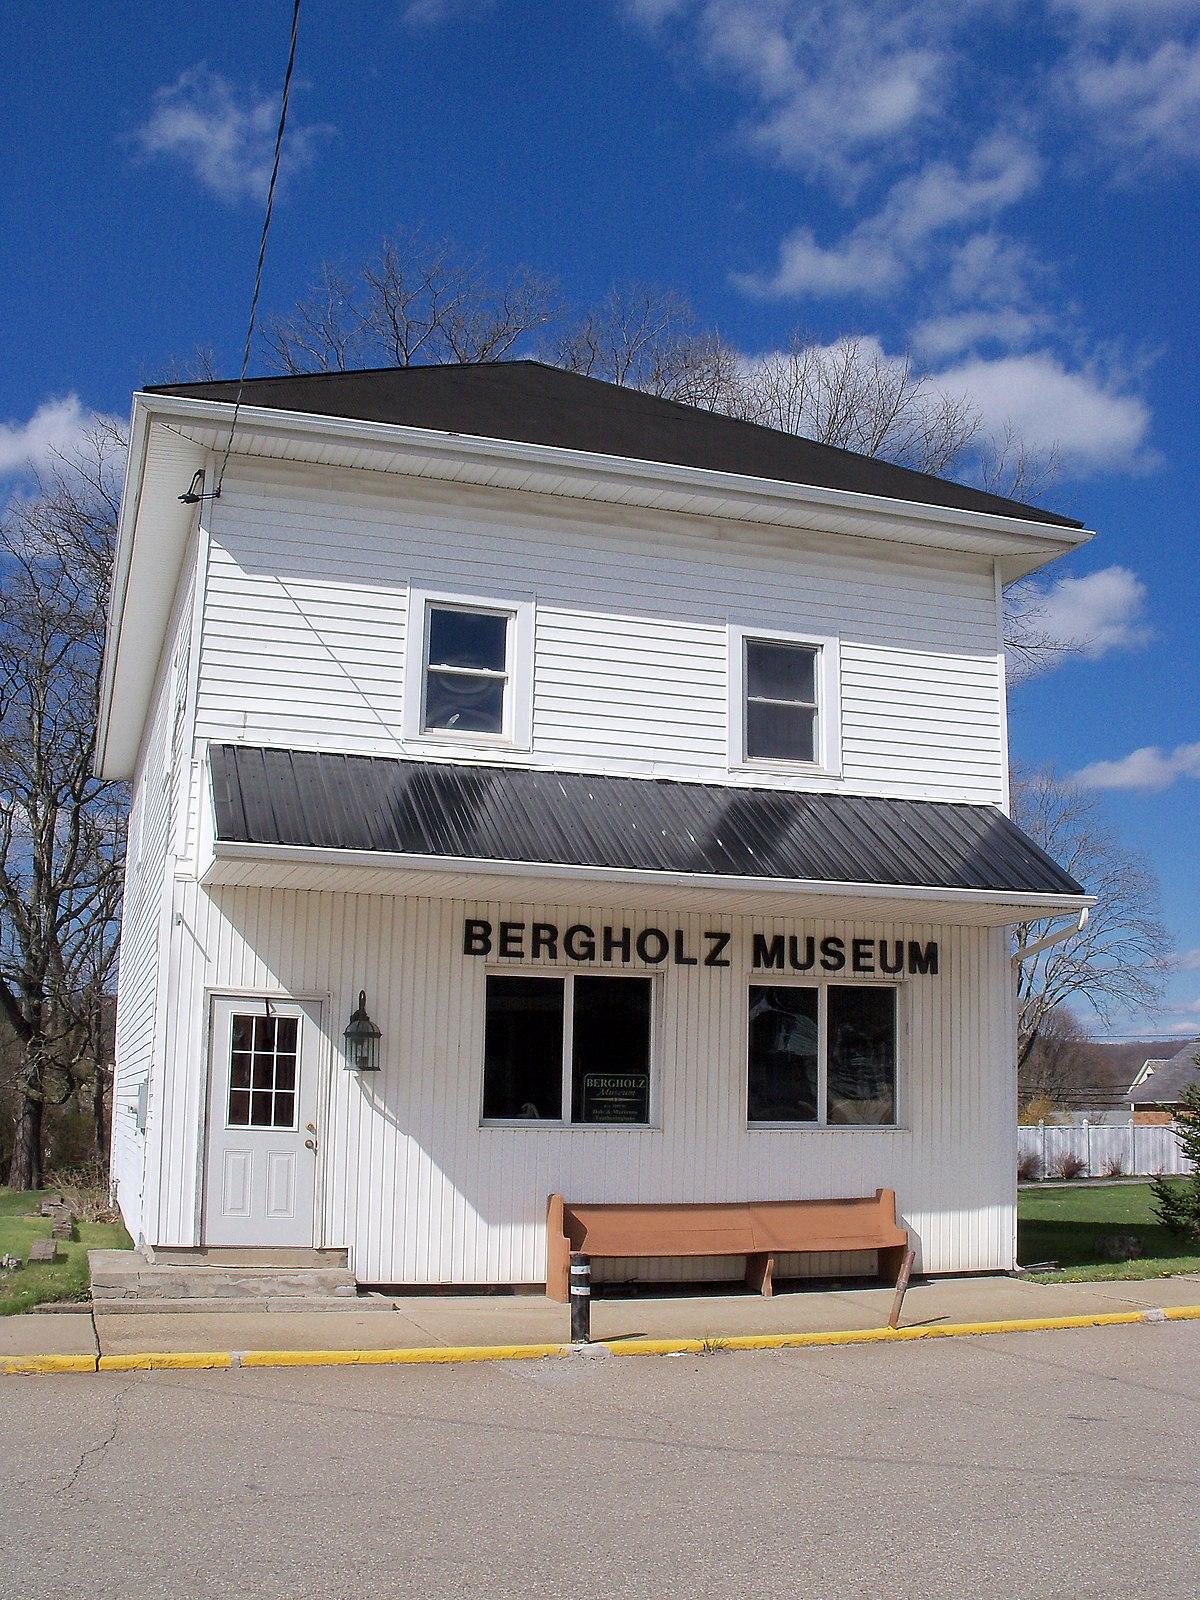 Ohio jefferson county bergholz - Ohio Jefferson County Bergholz 8